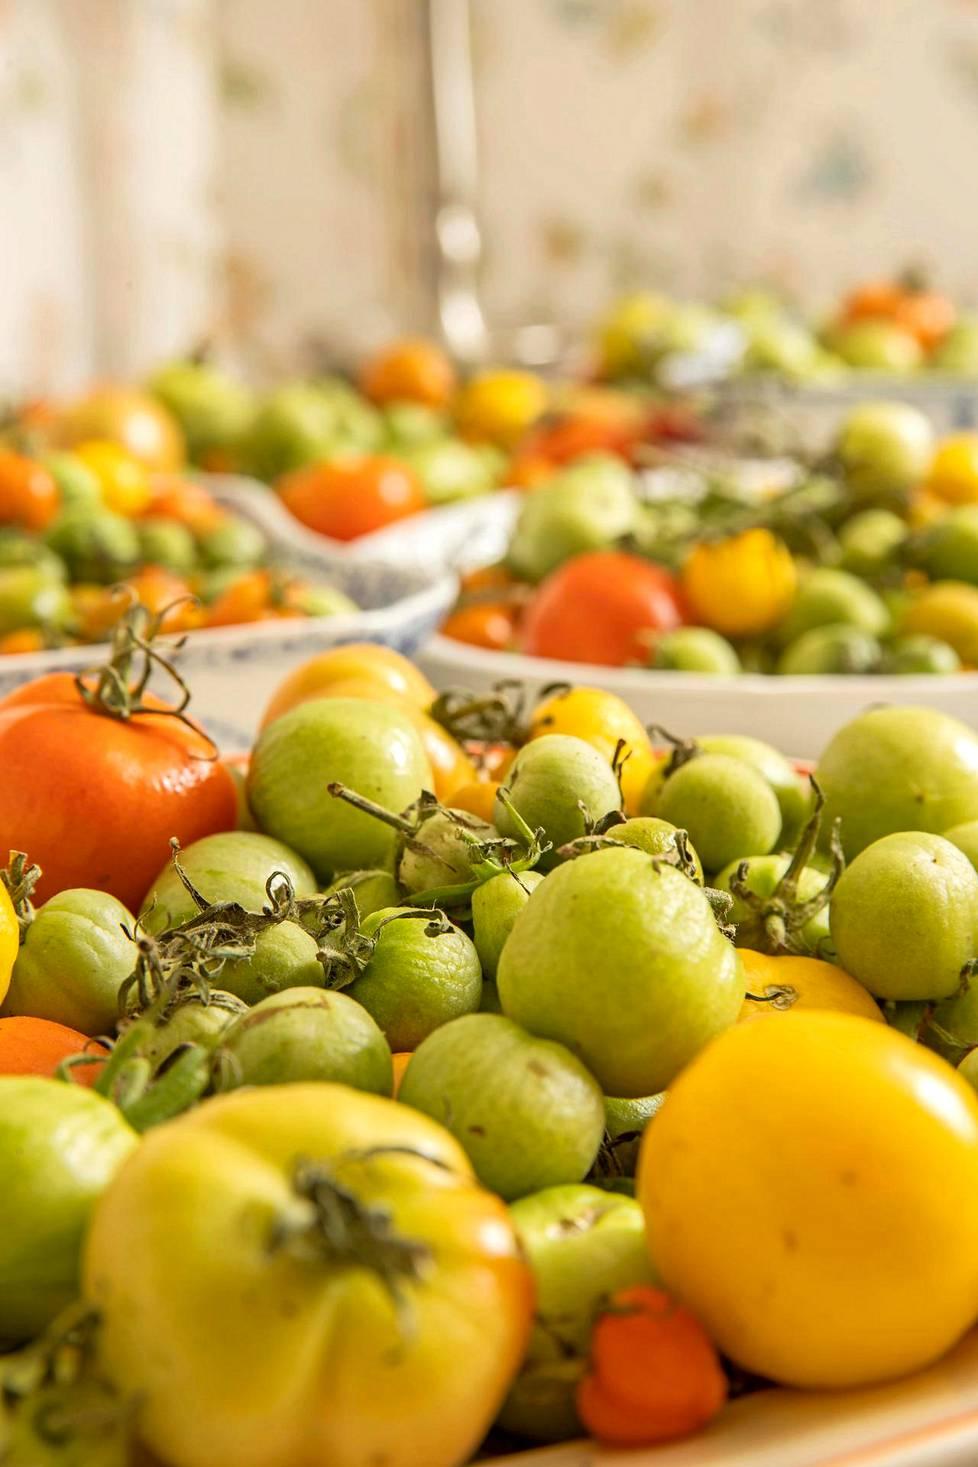 Tomaatteja viljellään omalla tilalla.